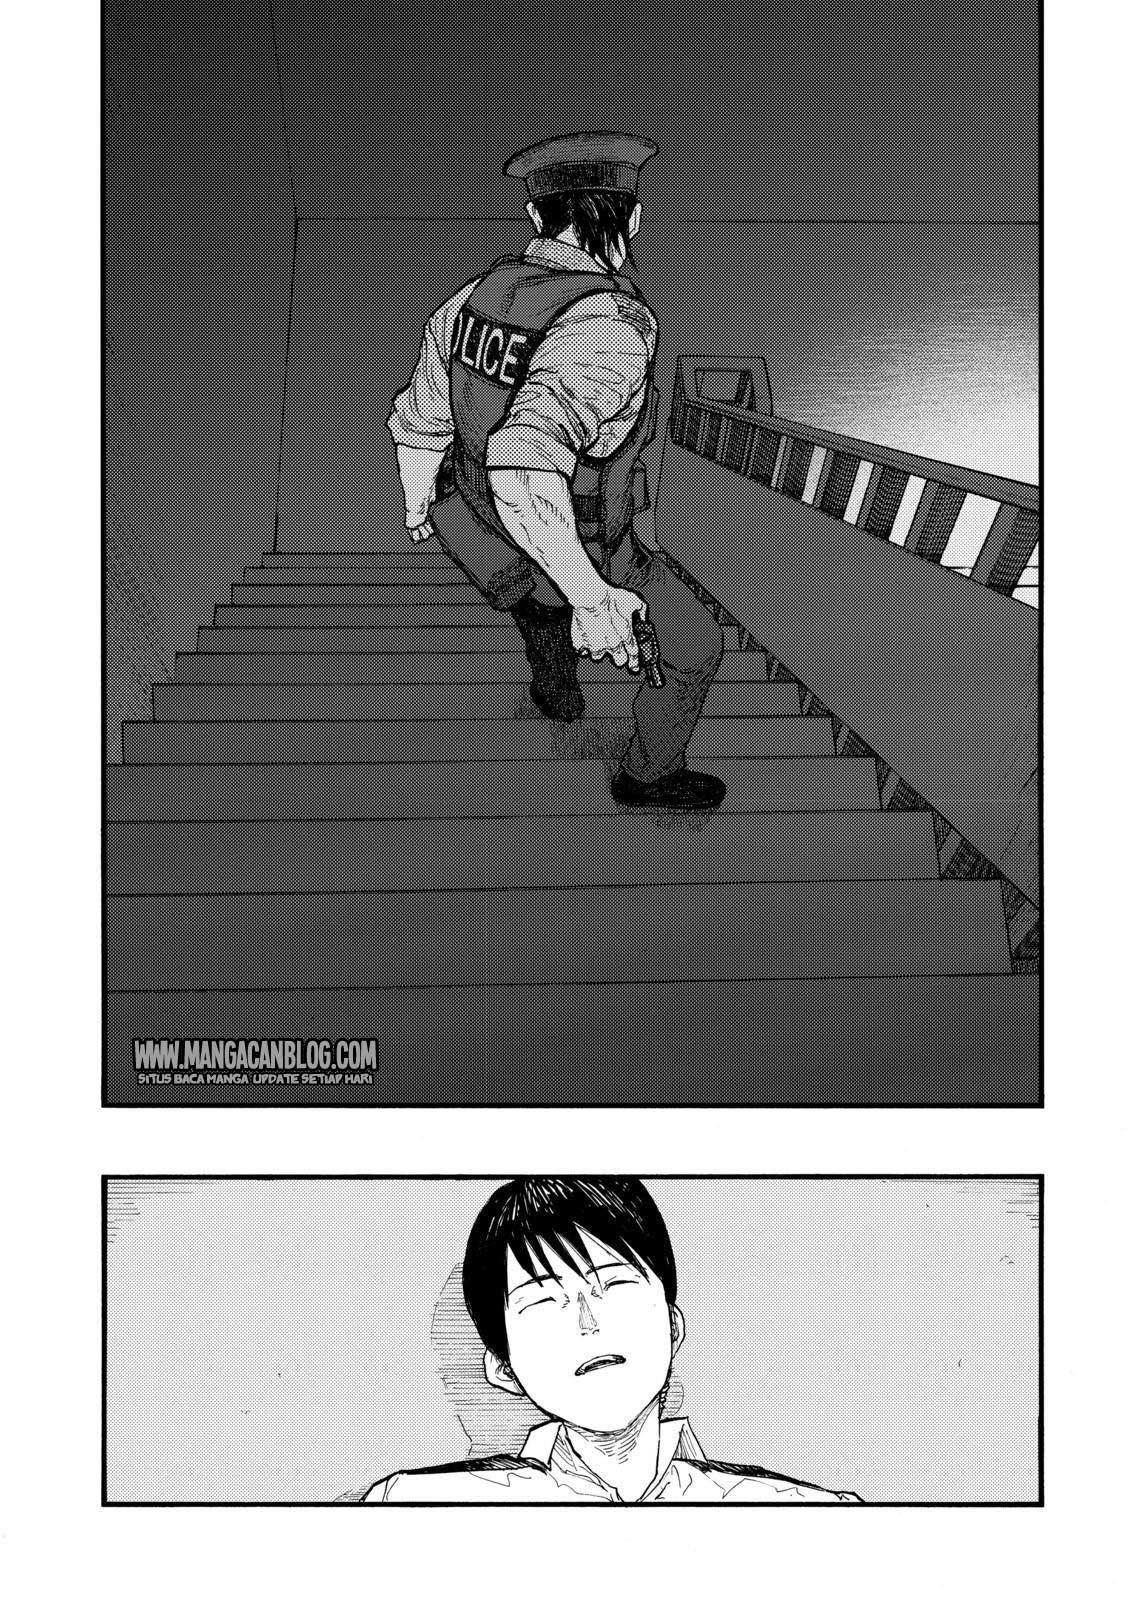 Dilarang COPAS - situs resmi www.mangacanblog.com - Komik ajin 039 - garis keras medan pertempuran 2 40 Indonesia ajin 039 - garis keras medan pertempuran 2 Terbaru 21|Baca Manga Komik Indonesia|Mangacan